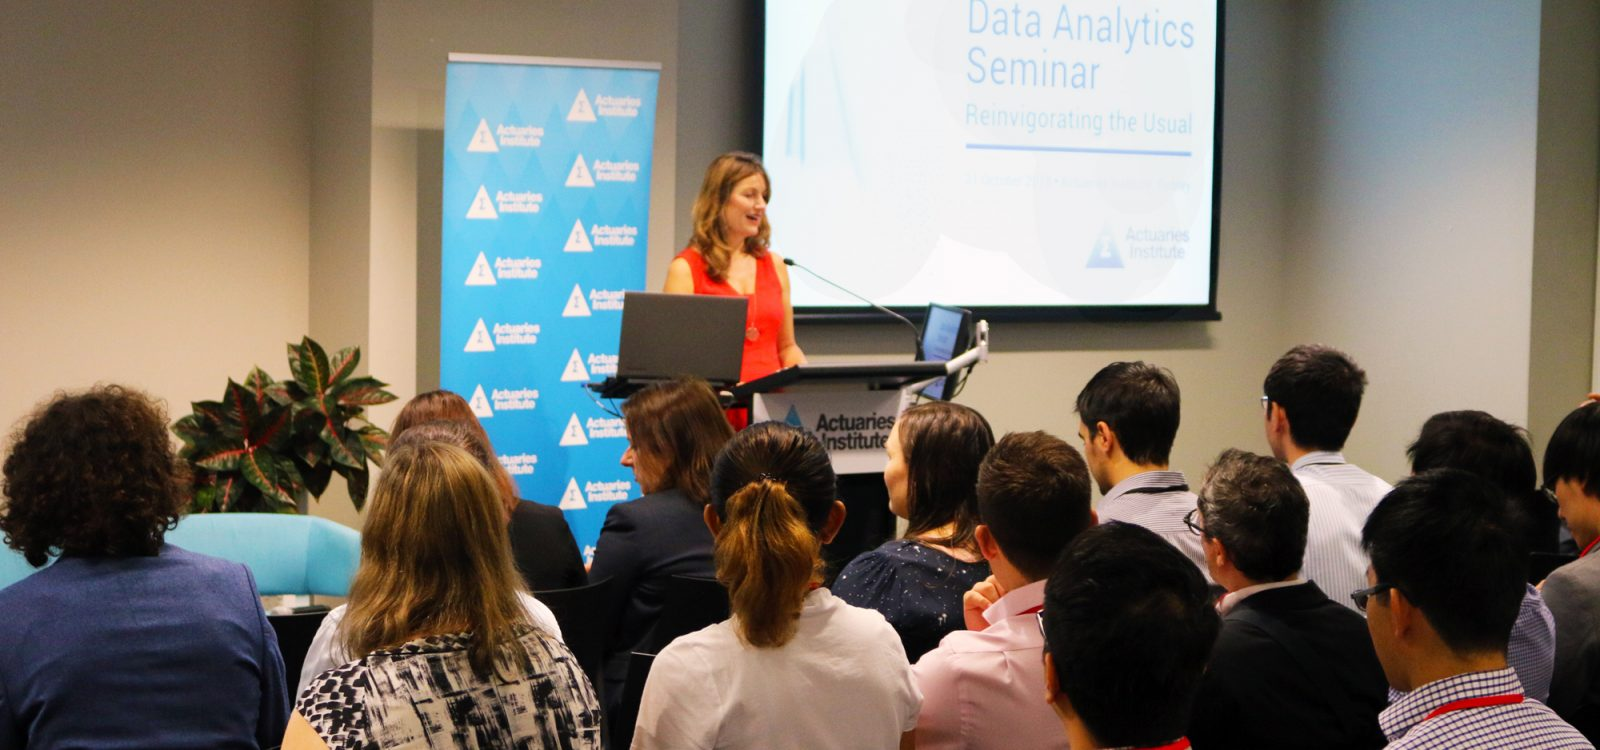 Data Analytics Seminar 2018: Reinvigorating the Usual